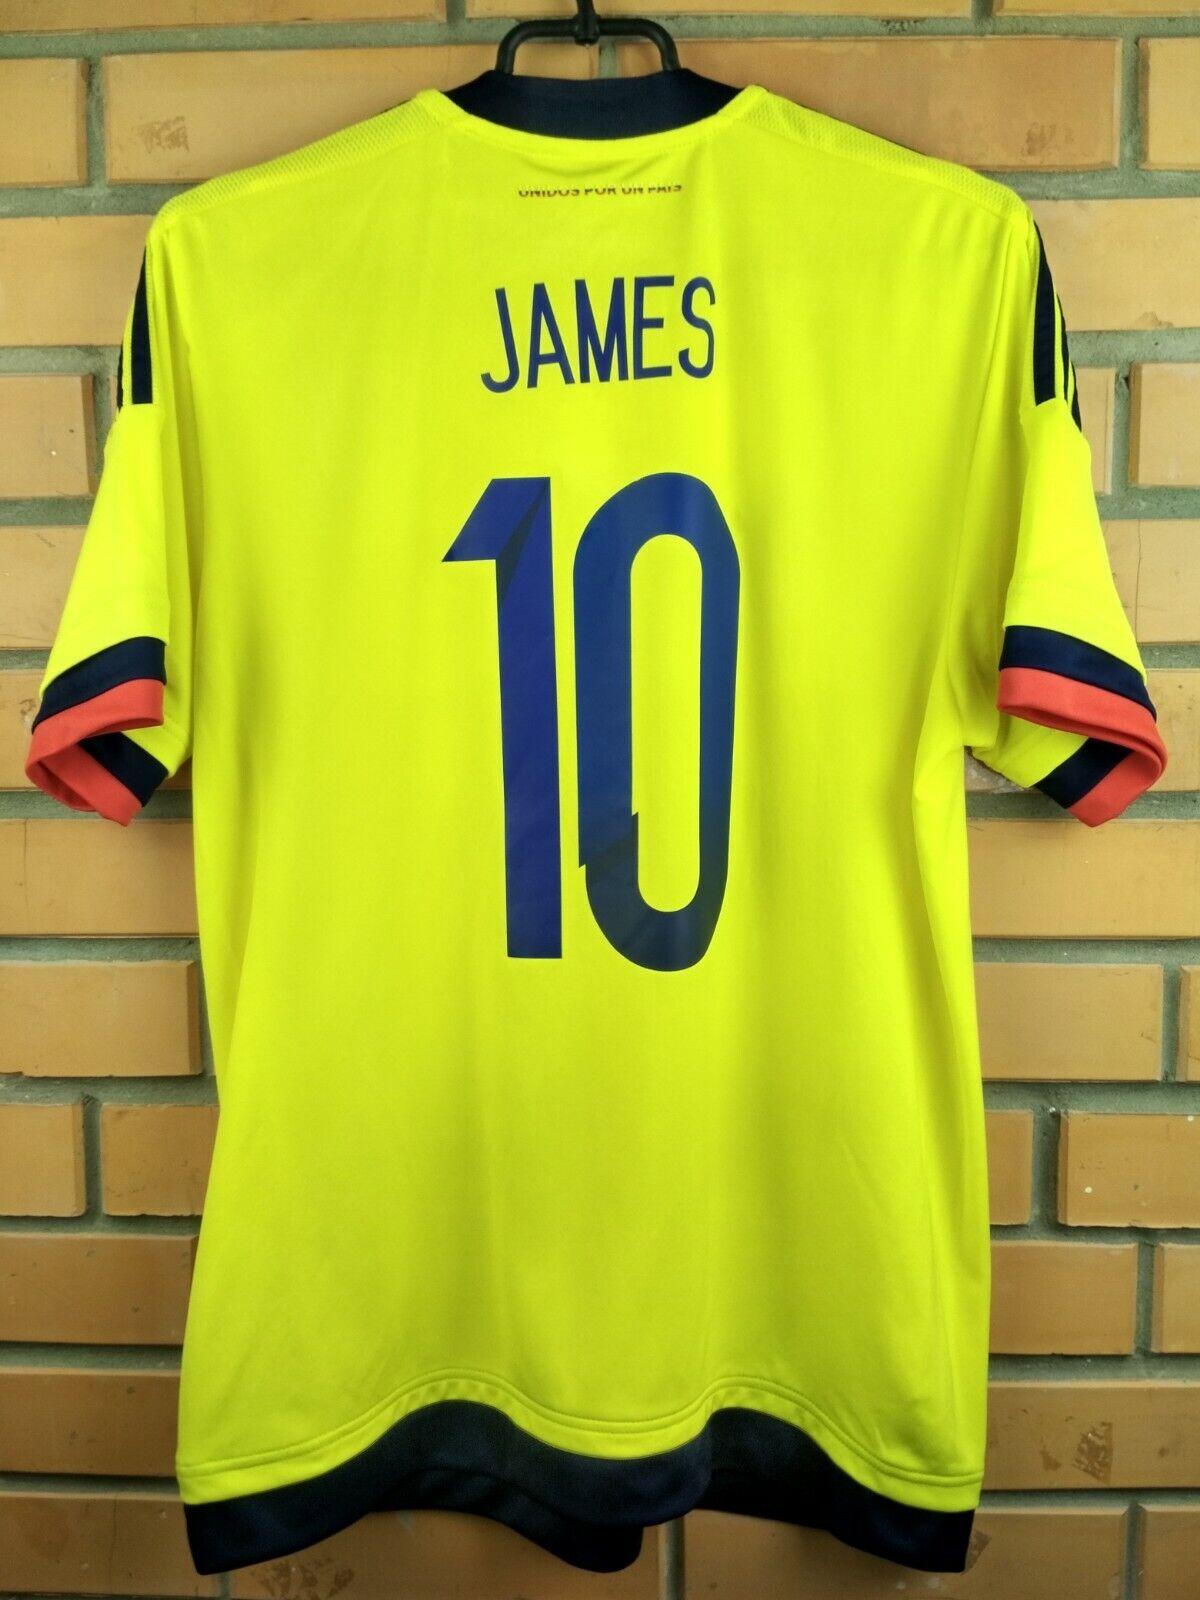 7108715ea38 10 10 James Colombia soccer jersey medium 2015 2017 shirt M62788 football  Adidas